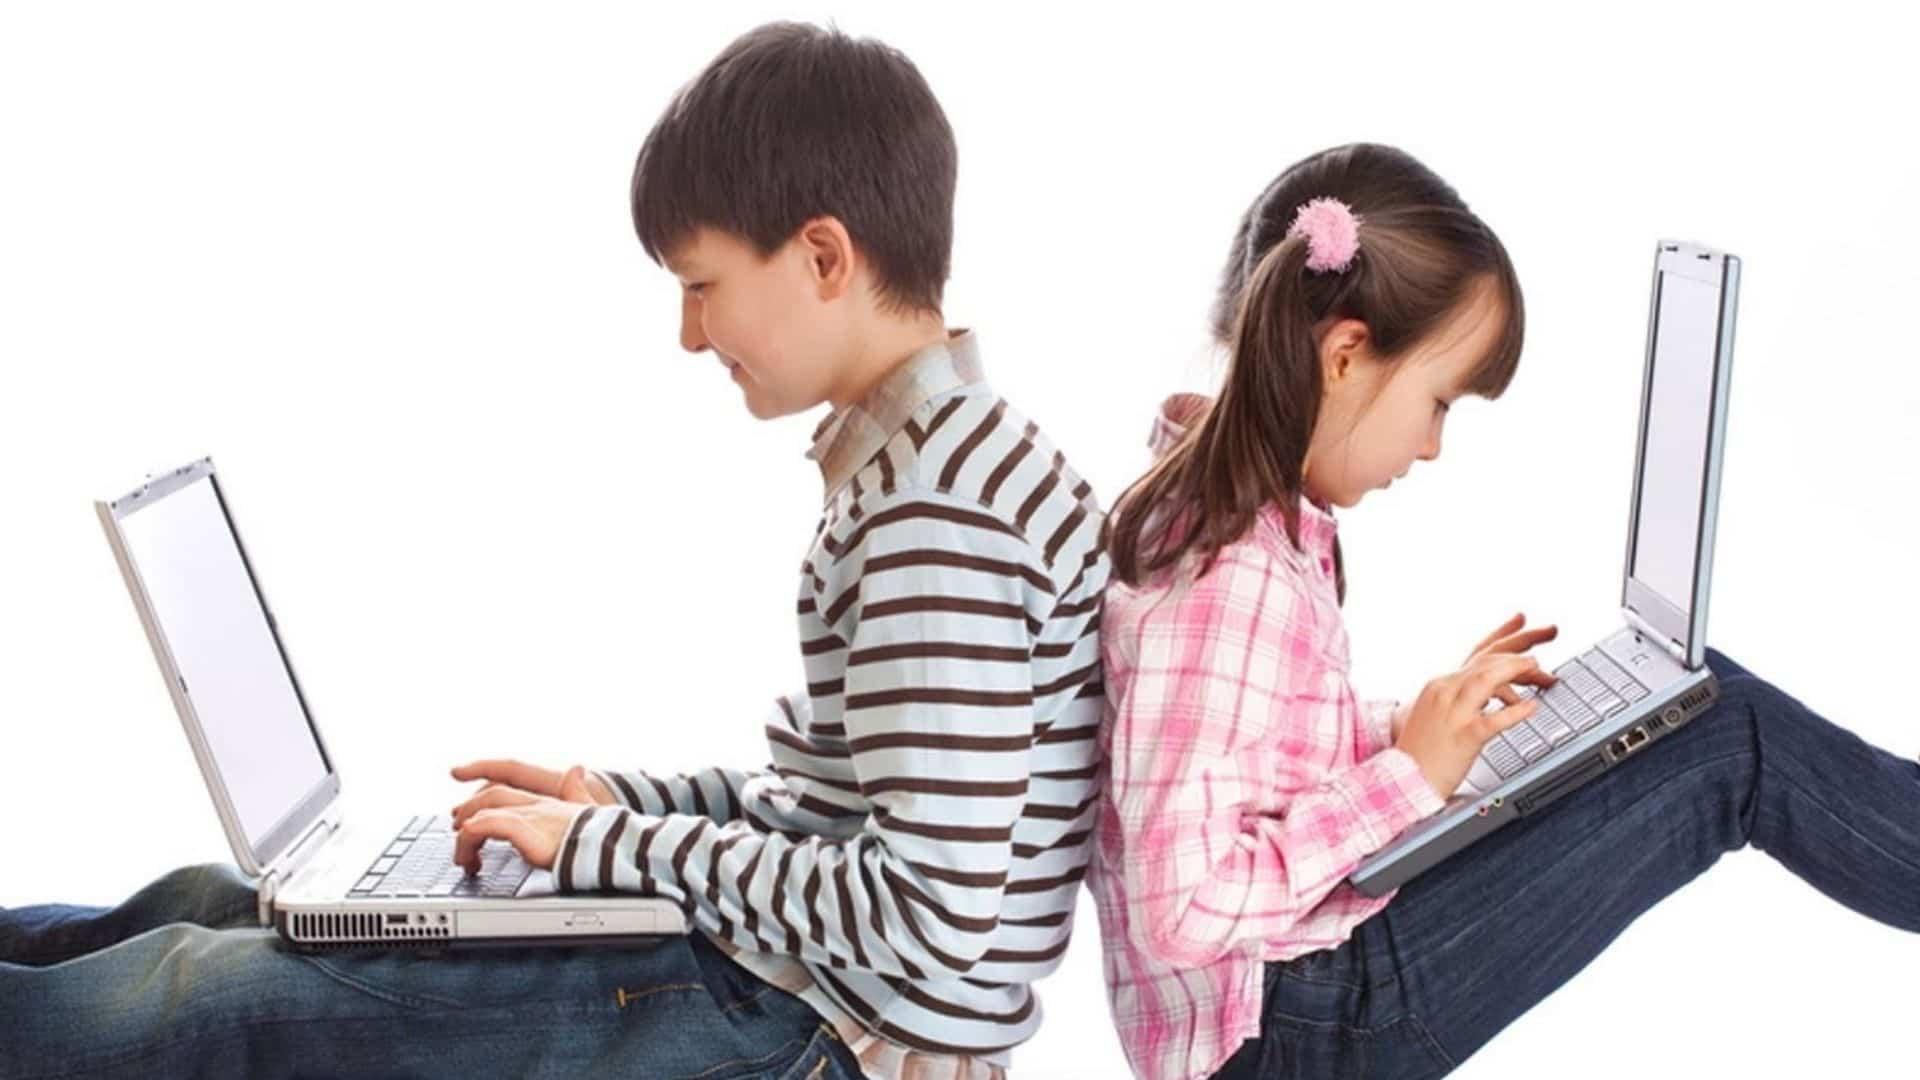 Introducing Tech Teenagers